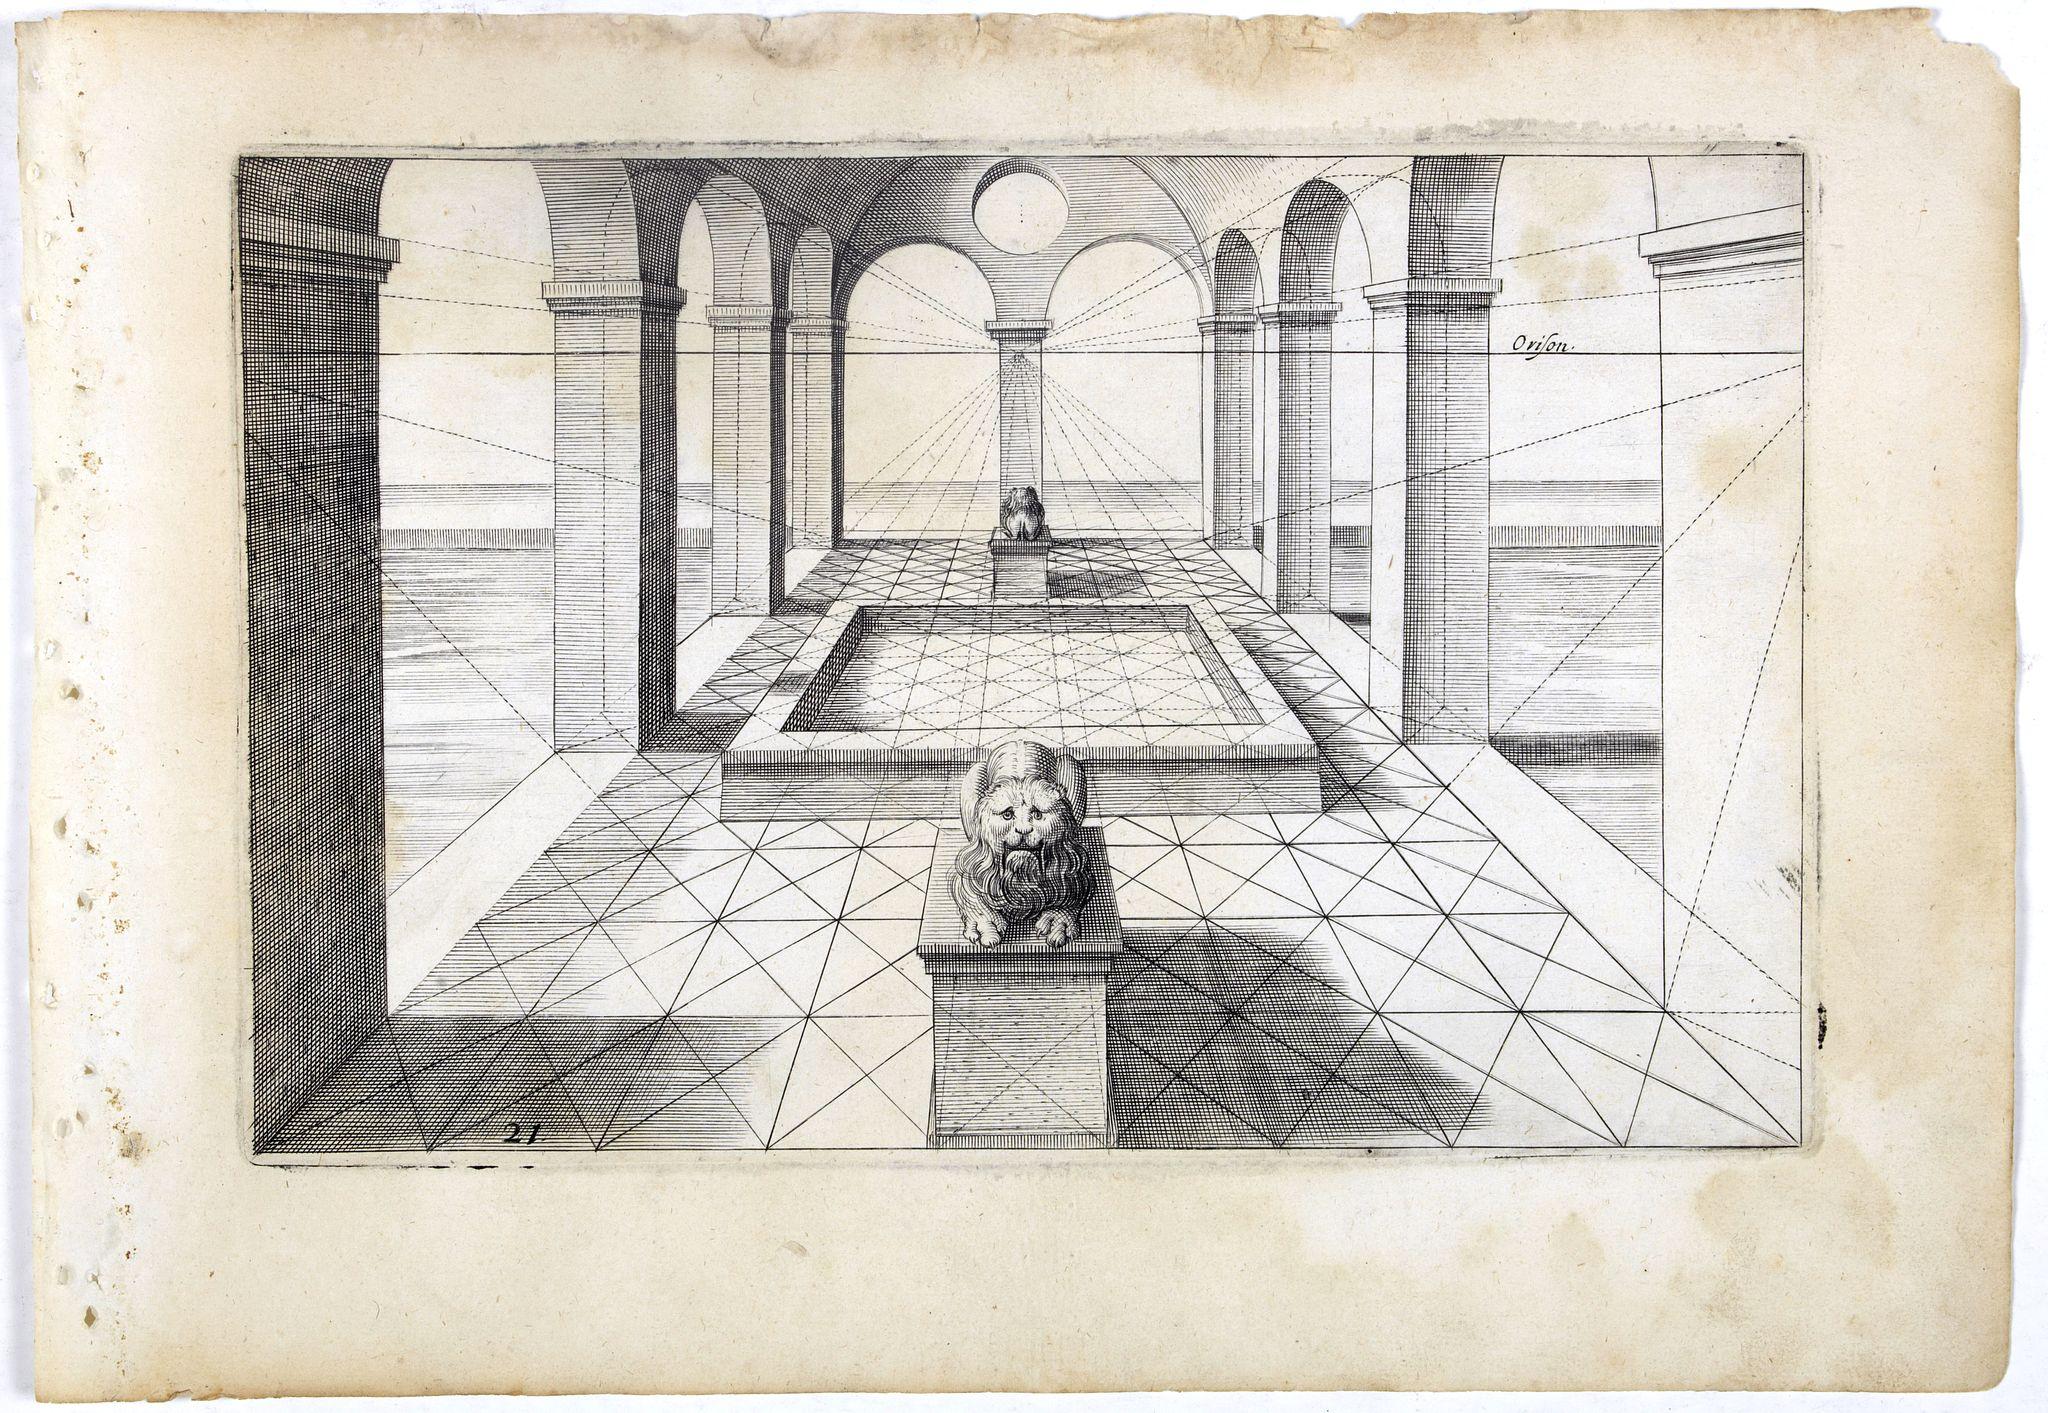 VREDEMAN DE VRIES, J. / HONDIUS, H. -  Perspective print by Vredeman de Vries. 21.